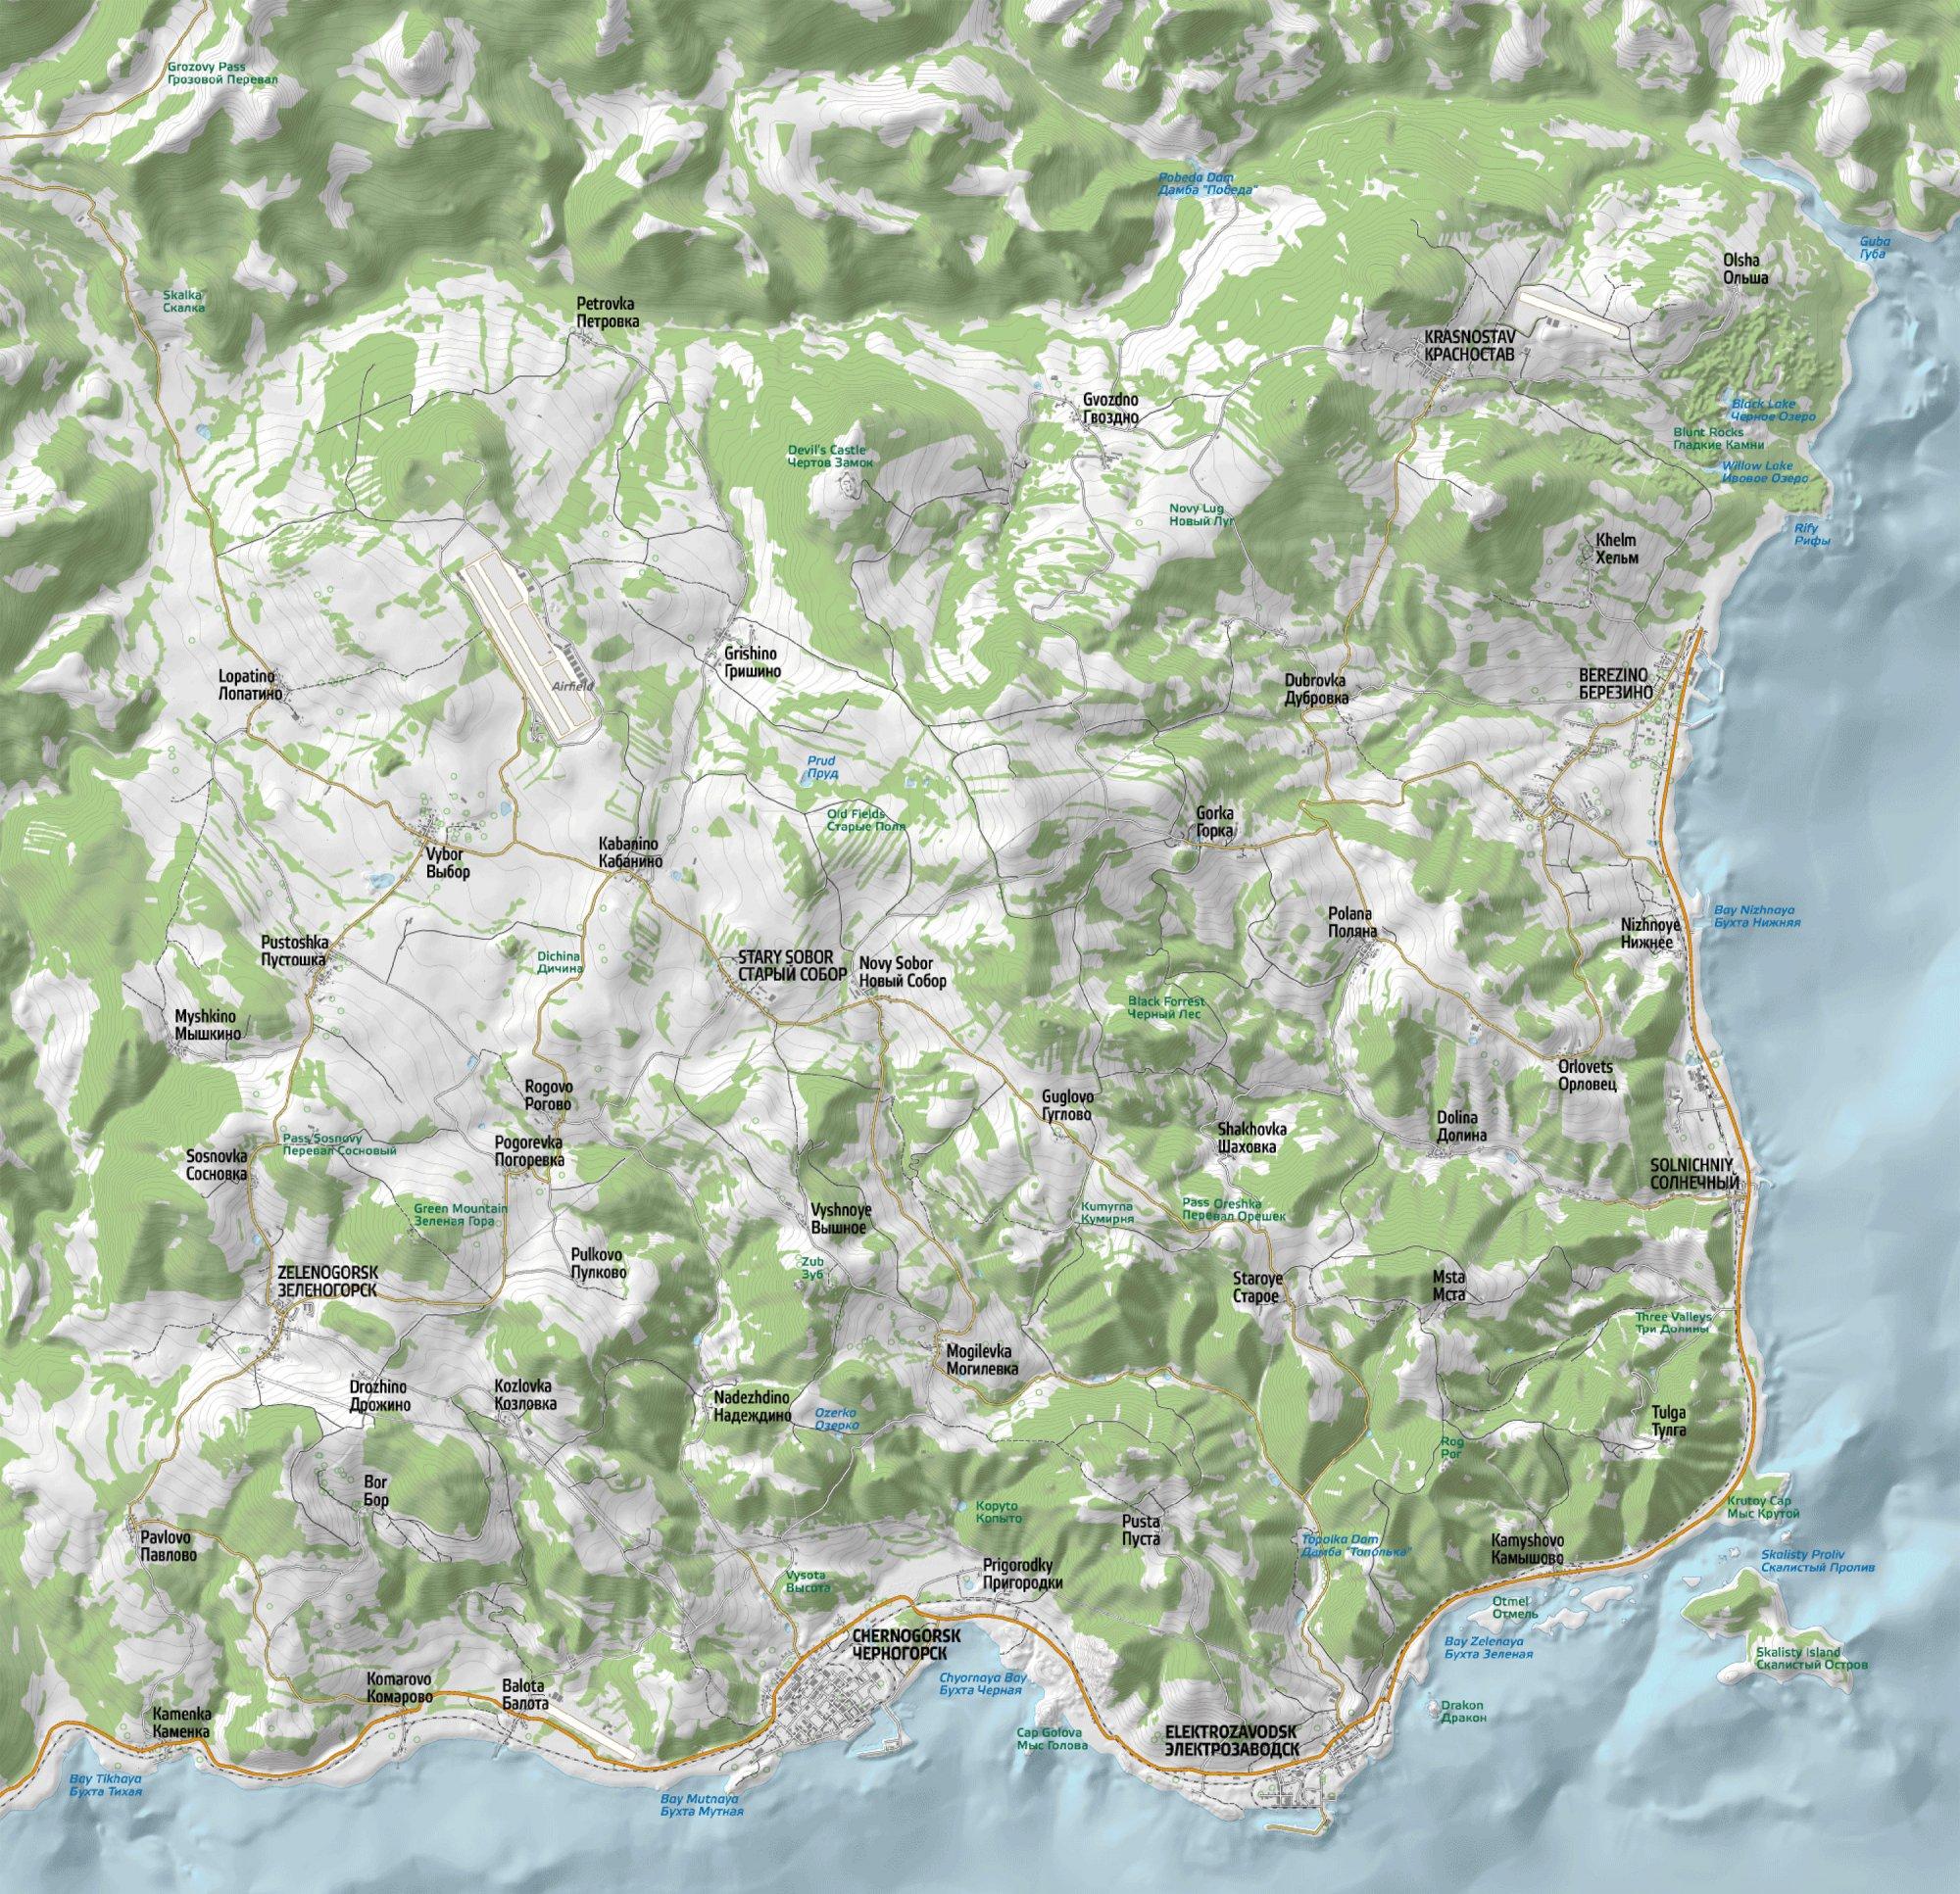 DayZ Map (Very Important)-chernarus_big_hq-2-jpg